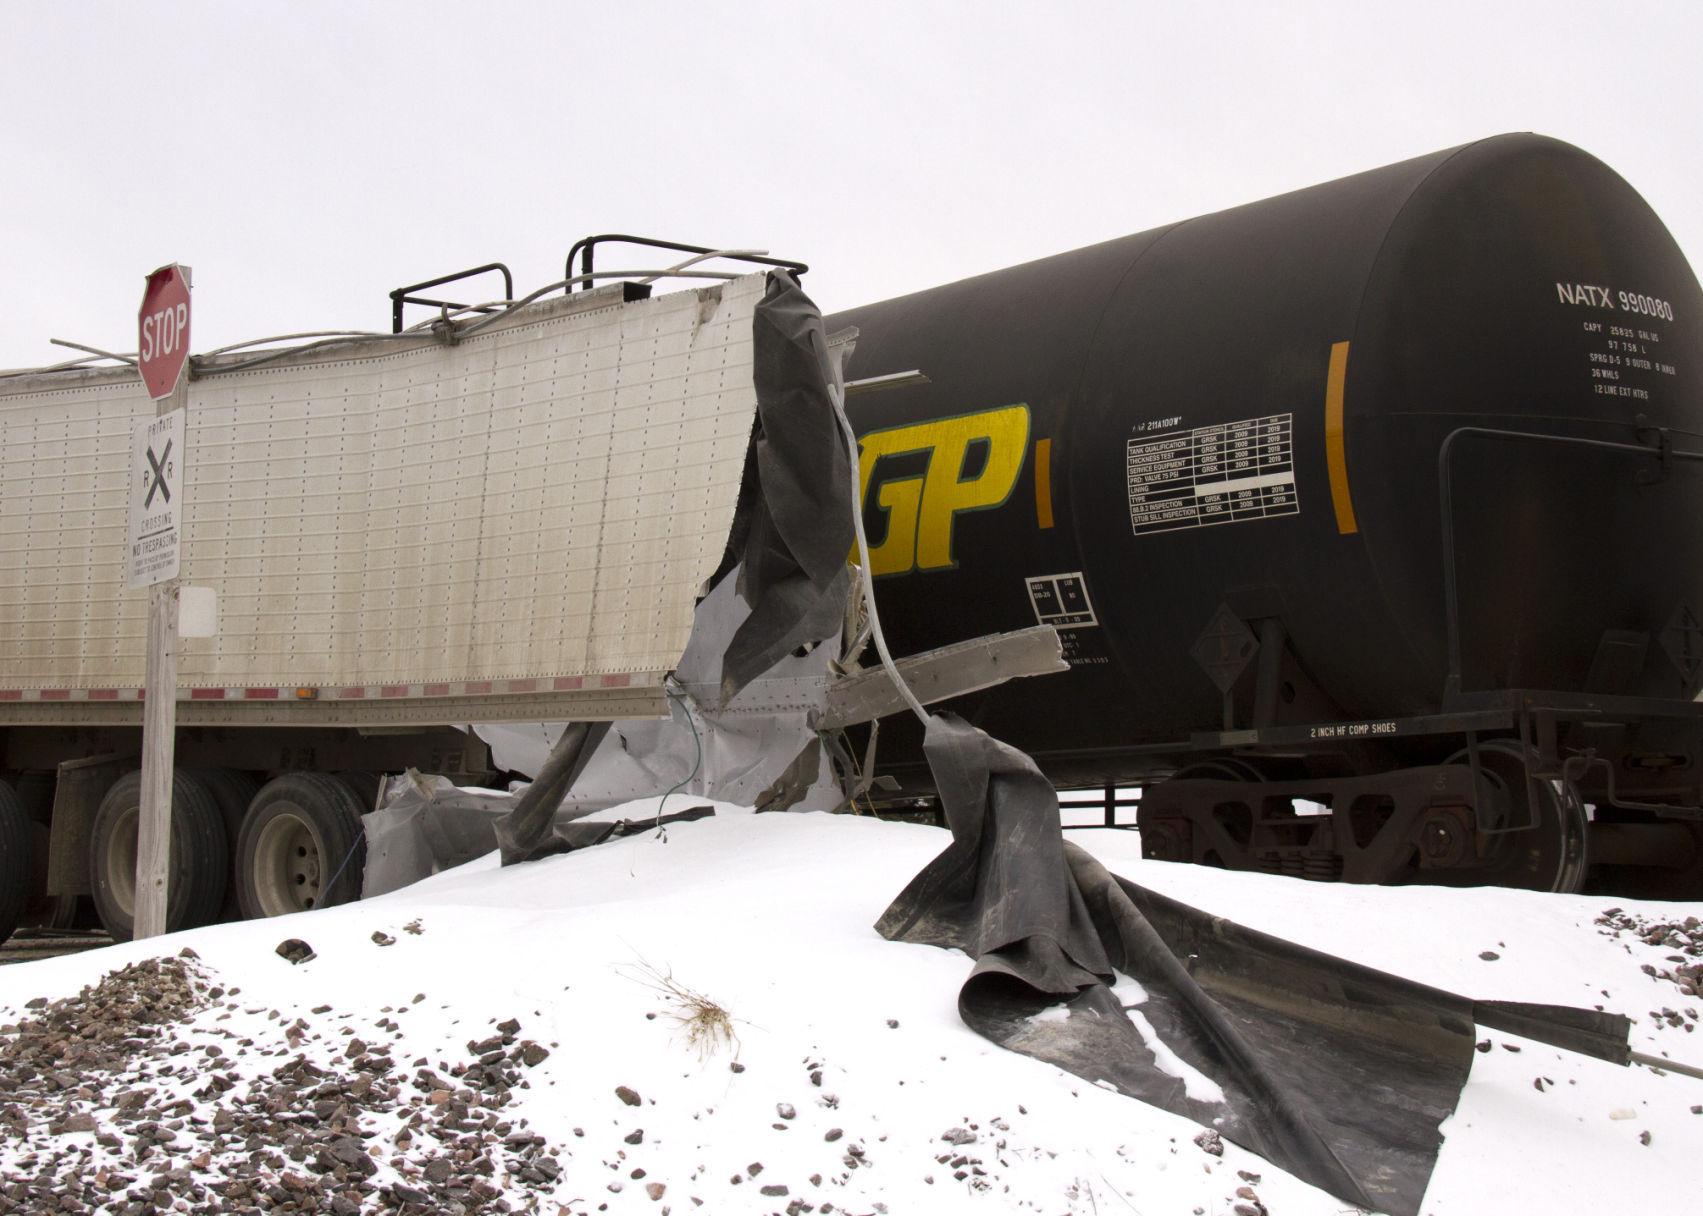 Semi cut in half during train crash Monday in Sioux City